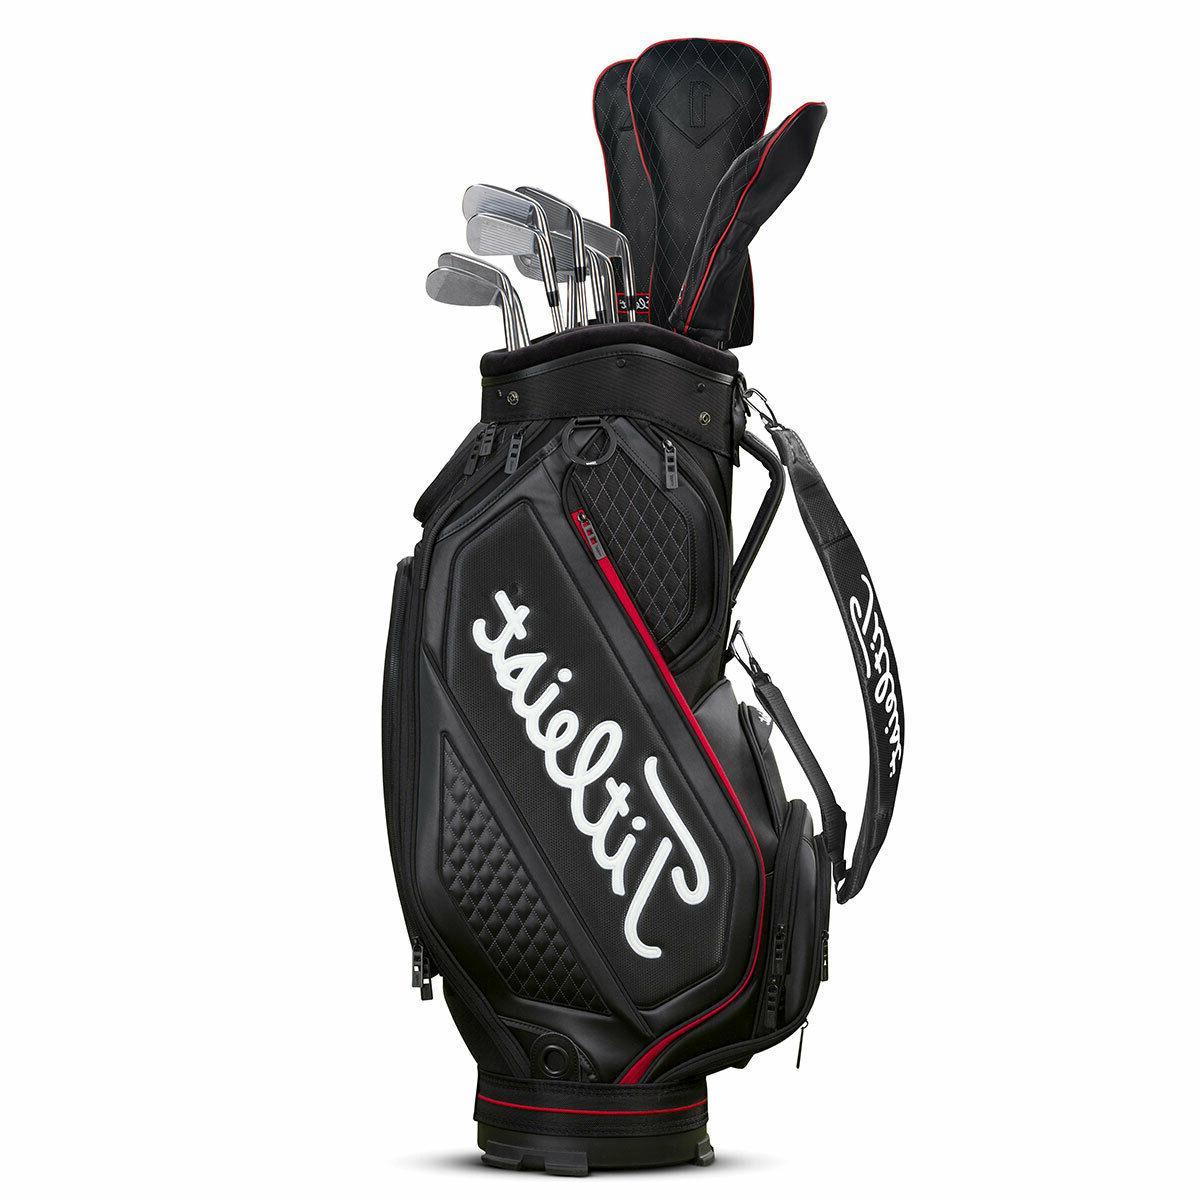 2020 midsize bag tb20sf4